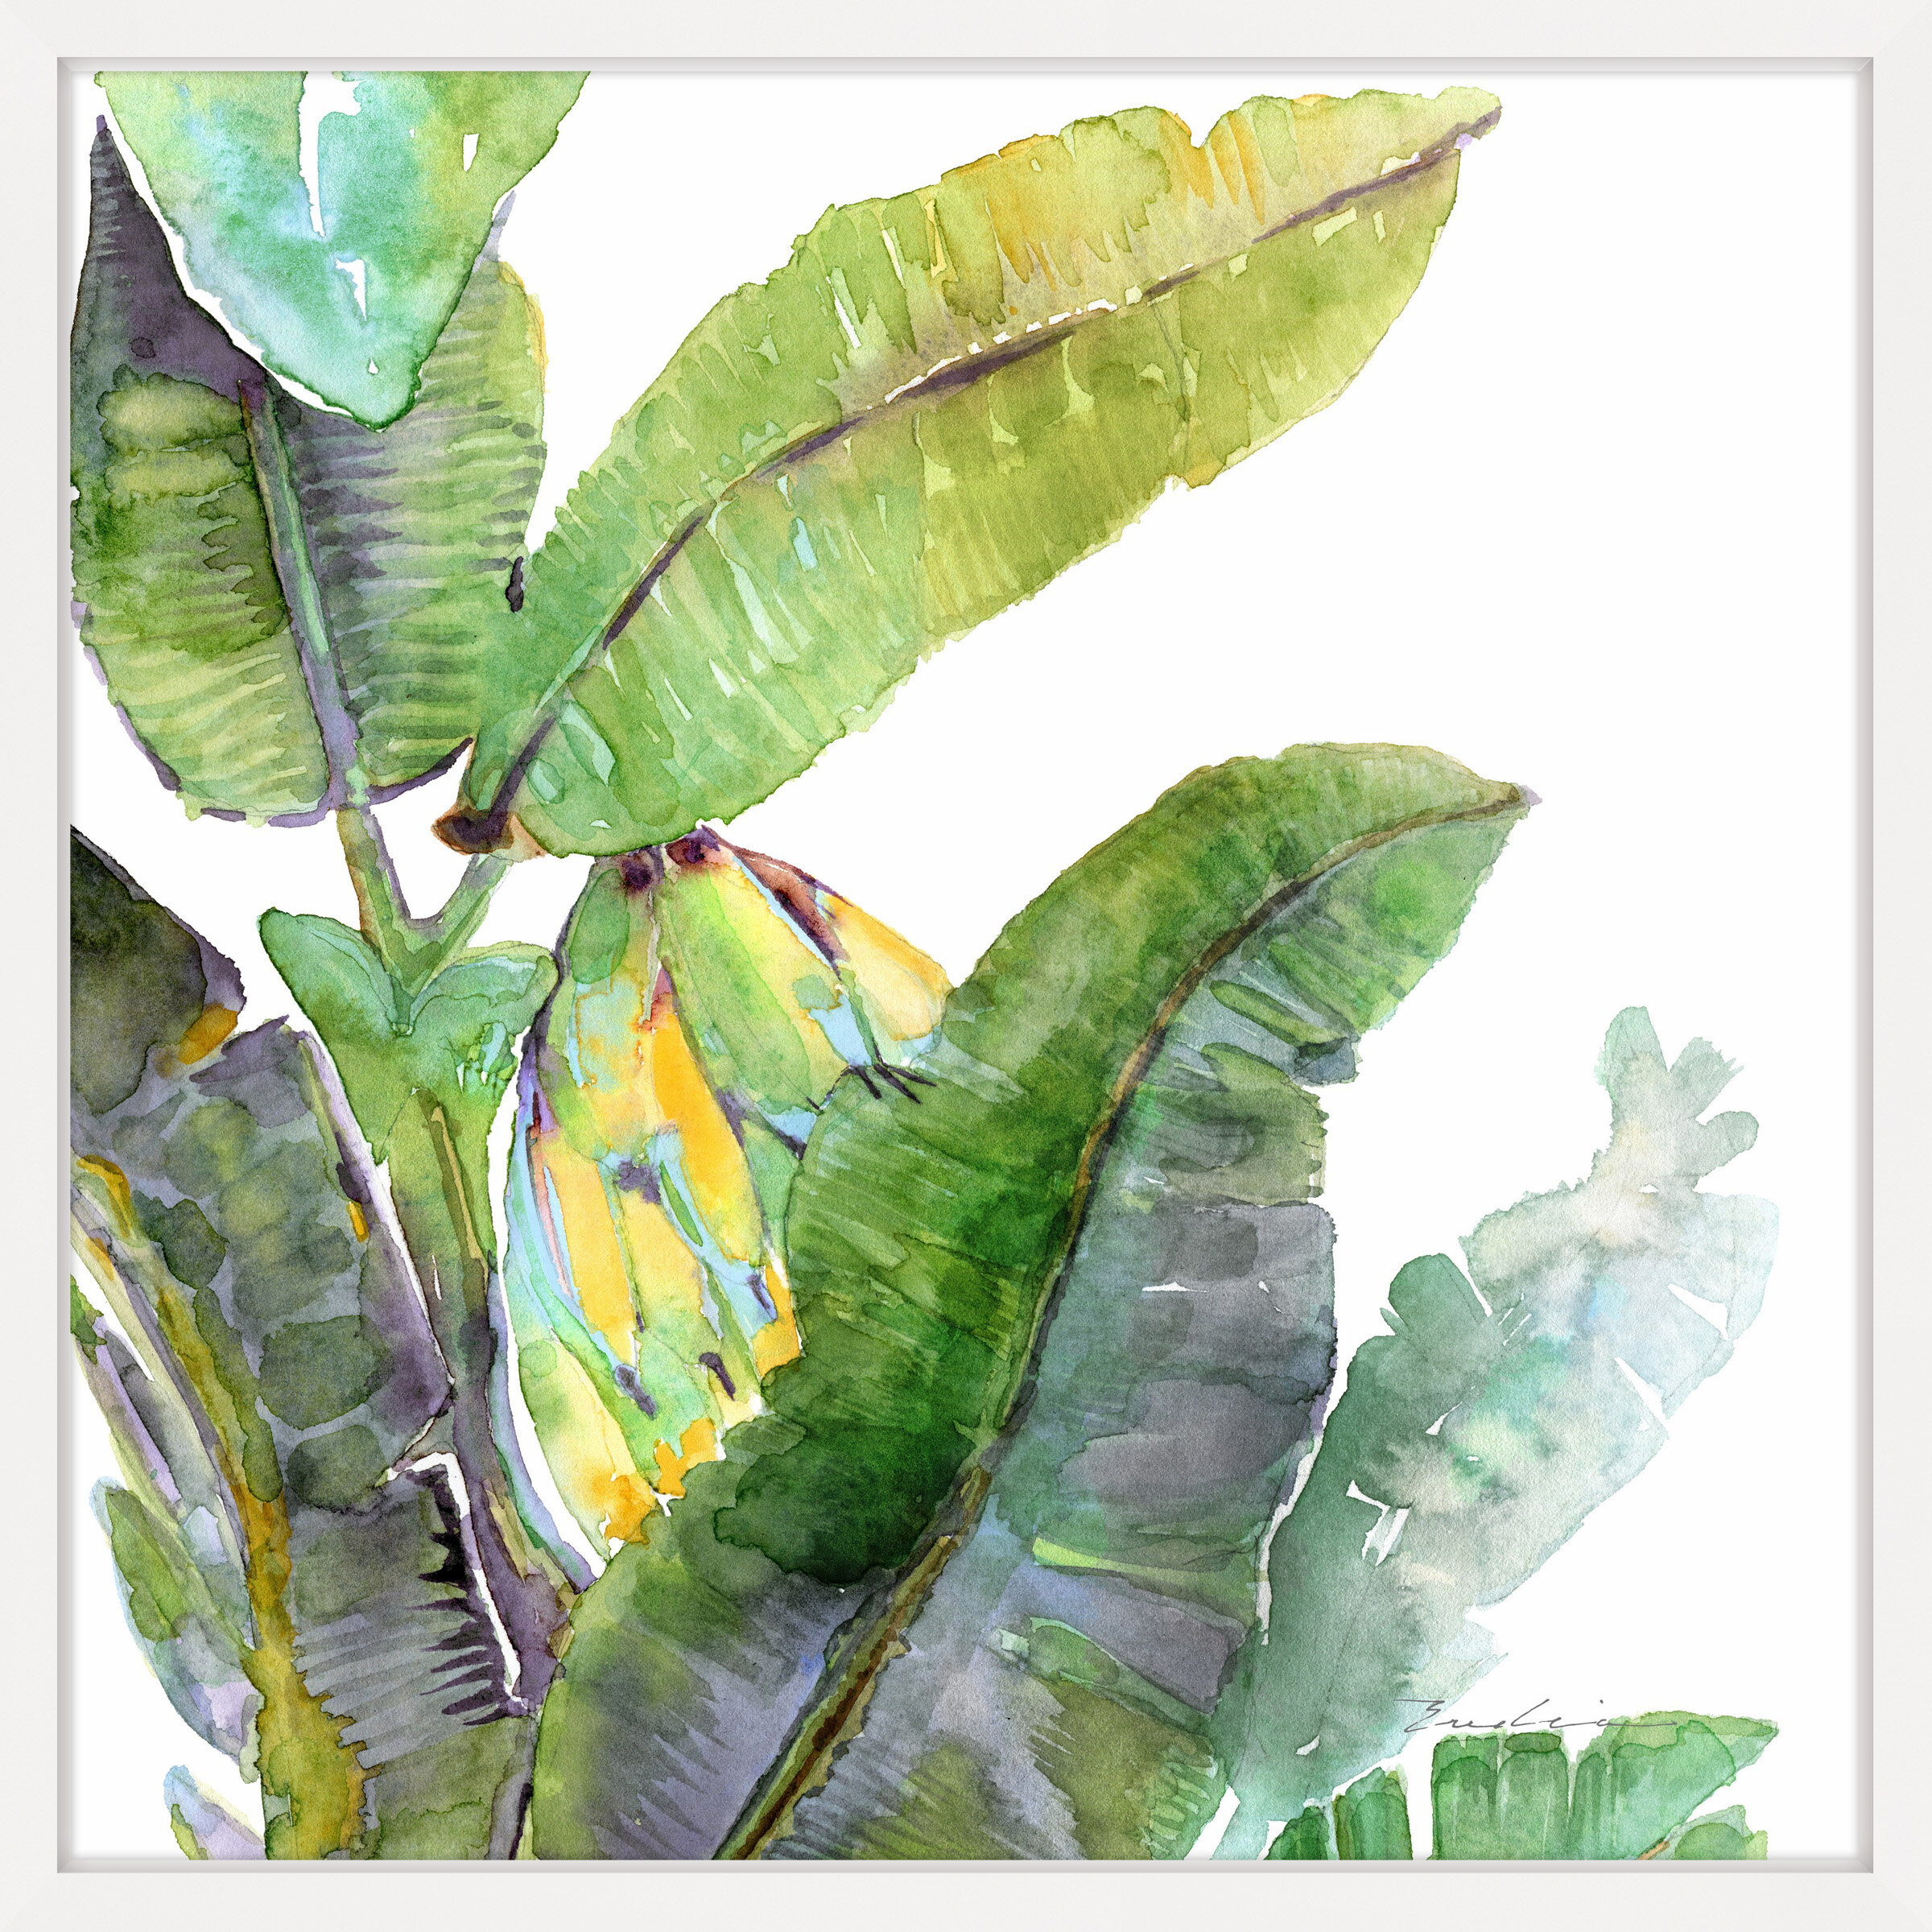 Bay Isle Home Banana Leaves One Framed Watercolor Painting Print Reviews Wayfair